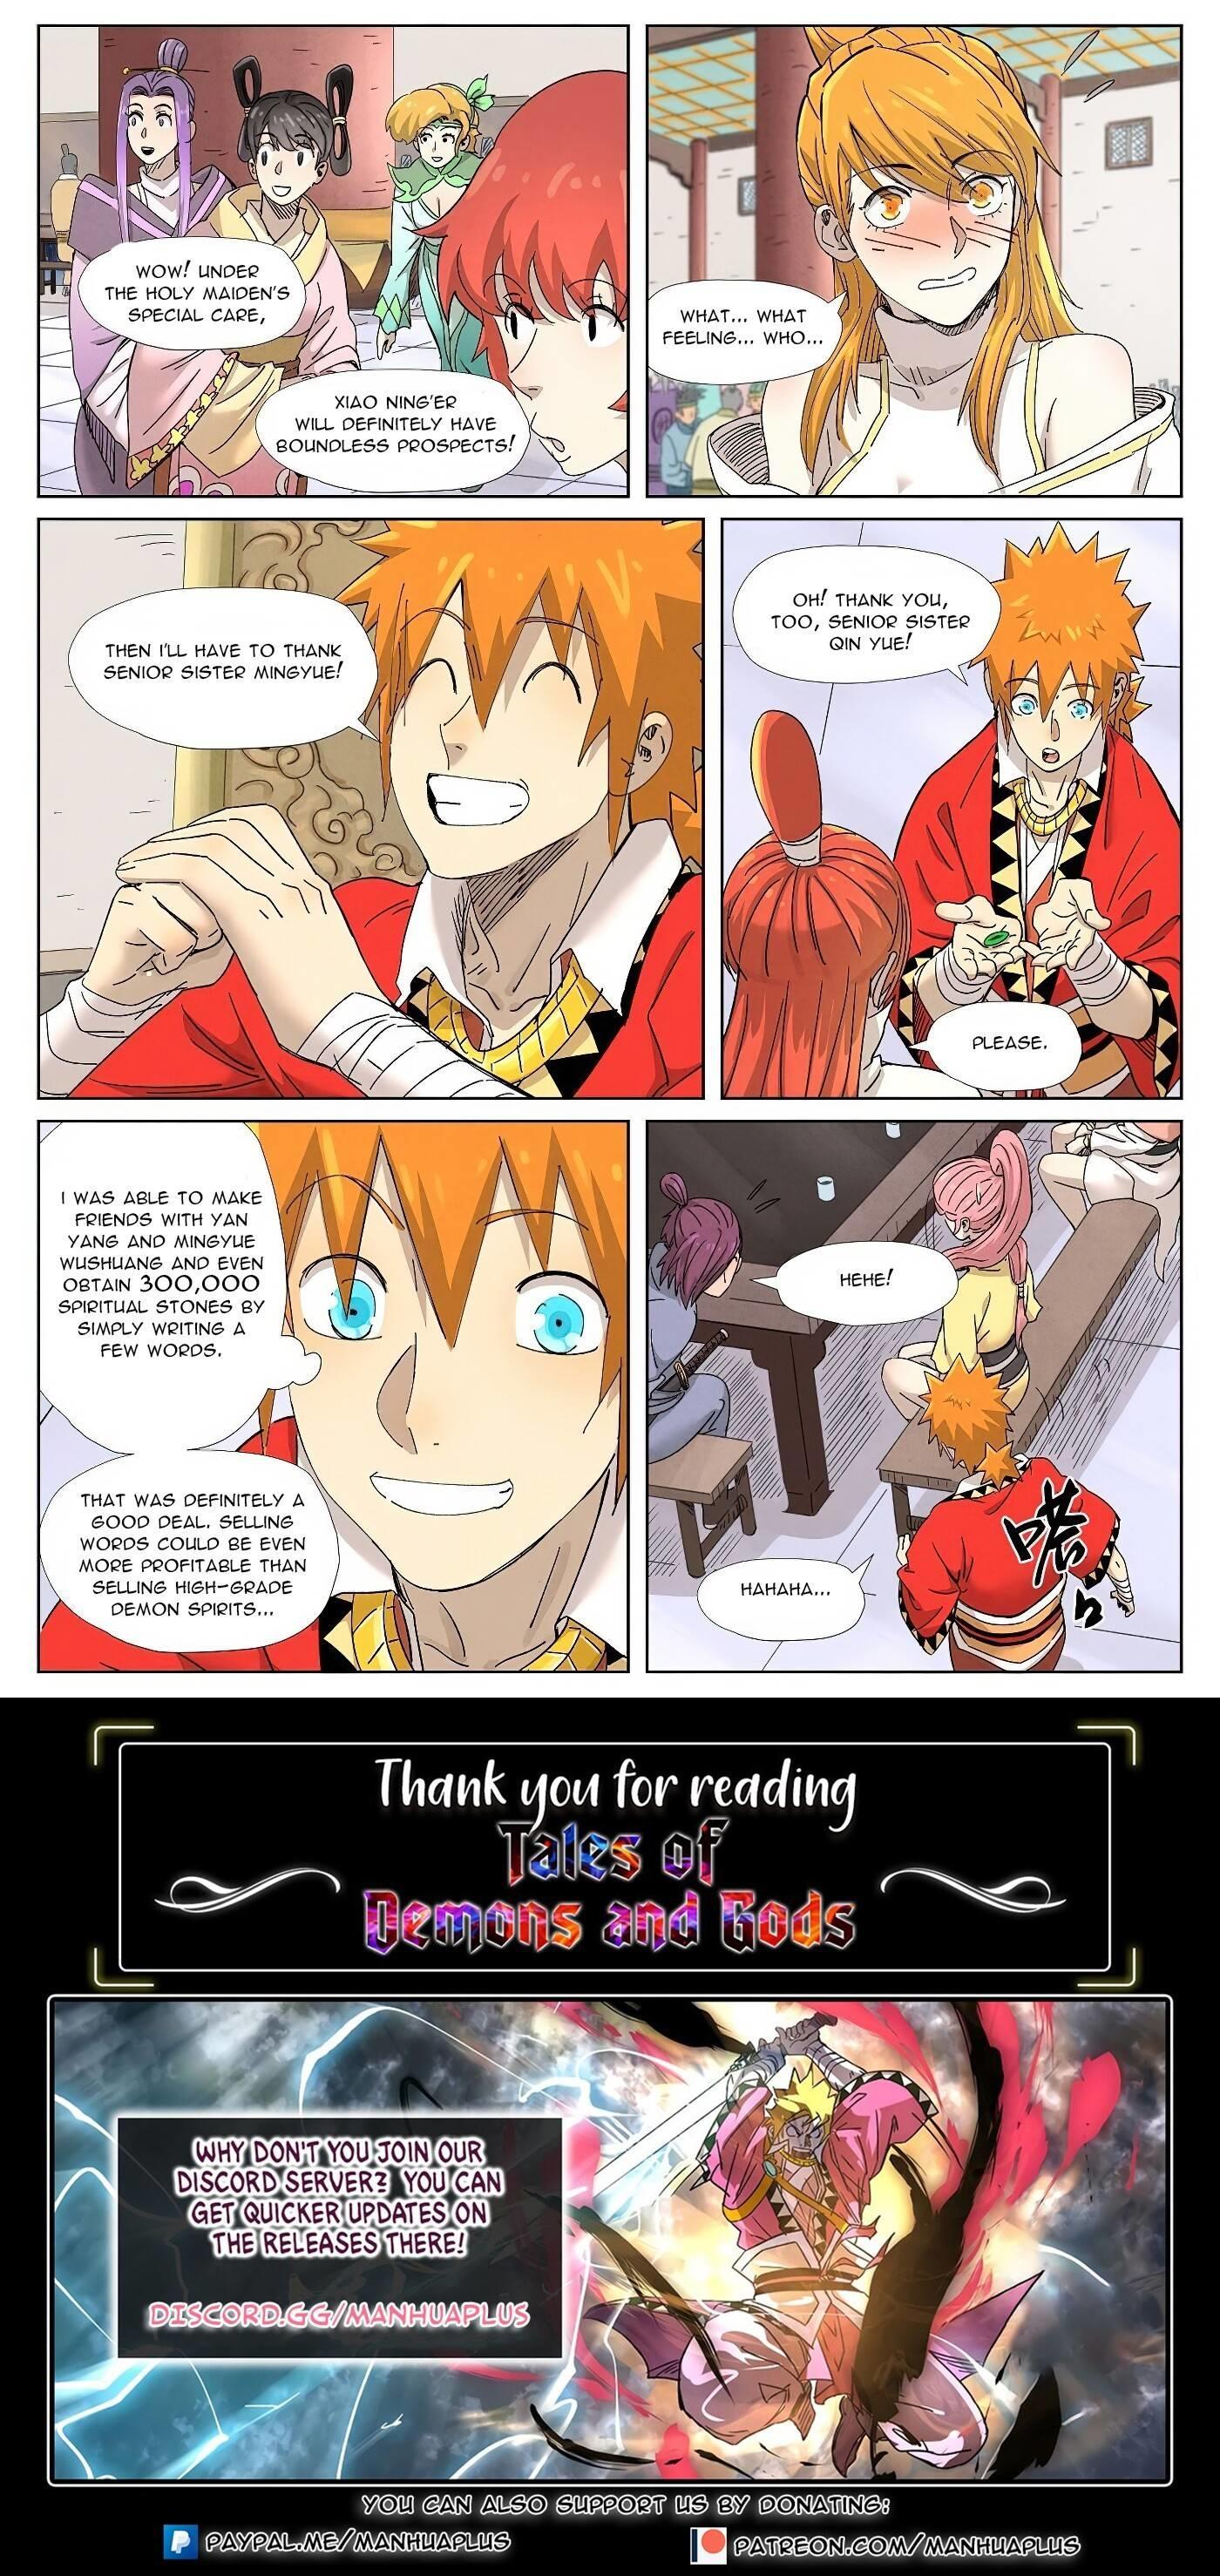 Tales Of Demons And Gods Chapter 342 page 10 - Mangakakalot